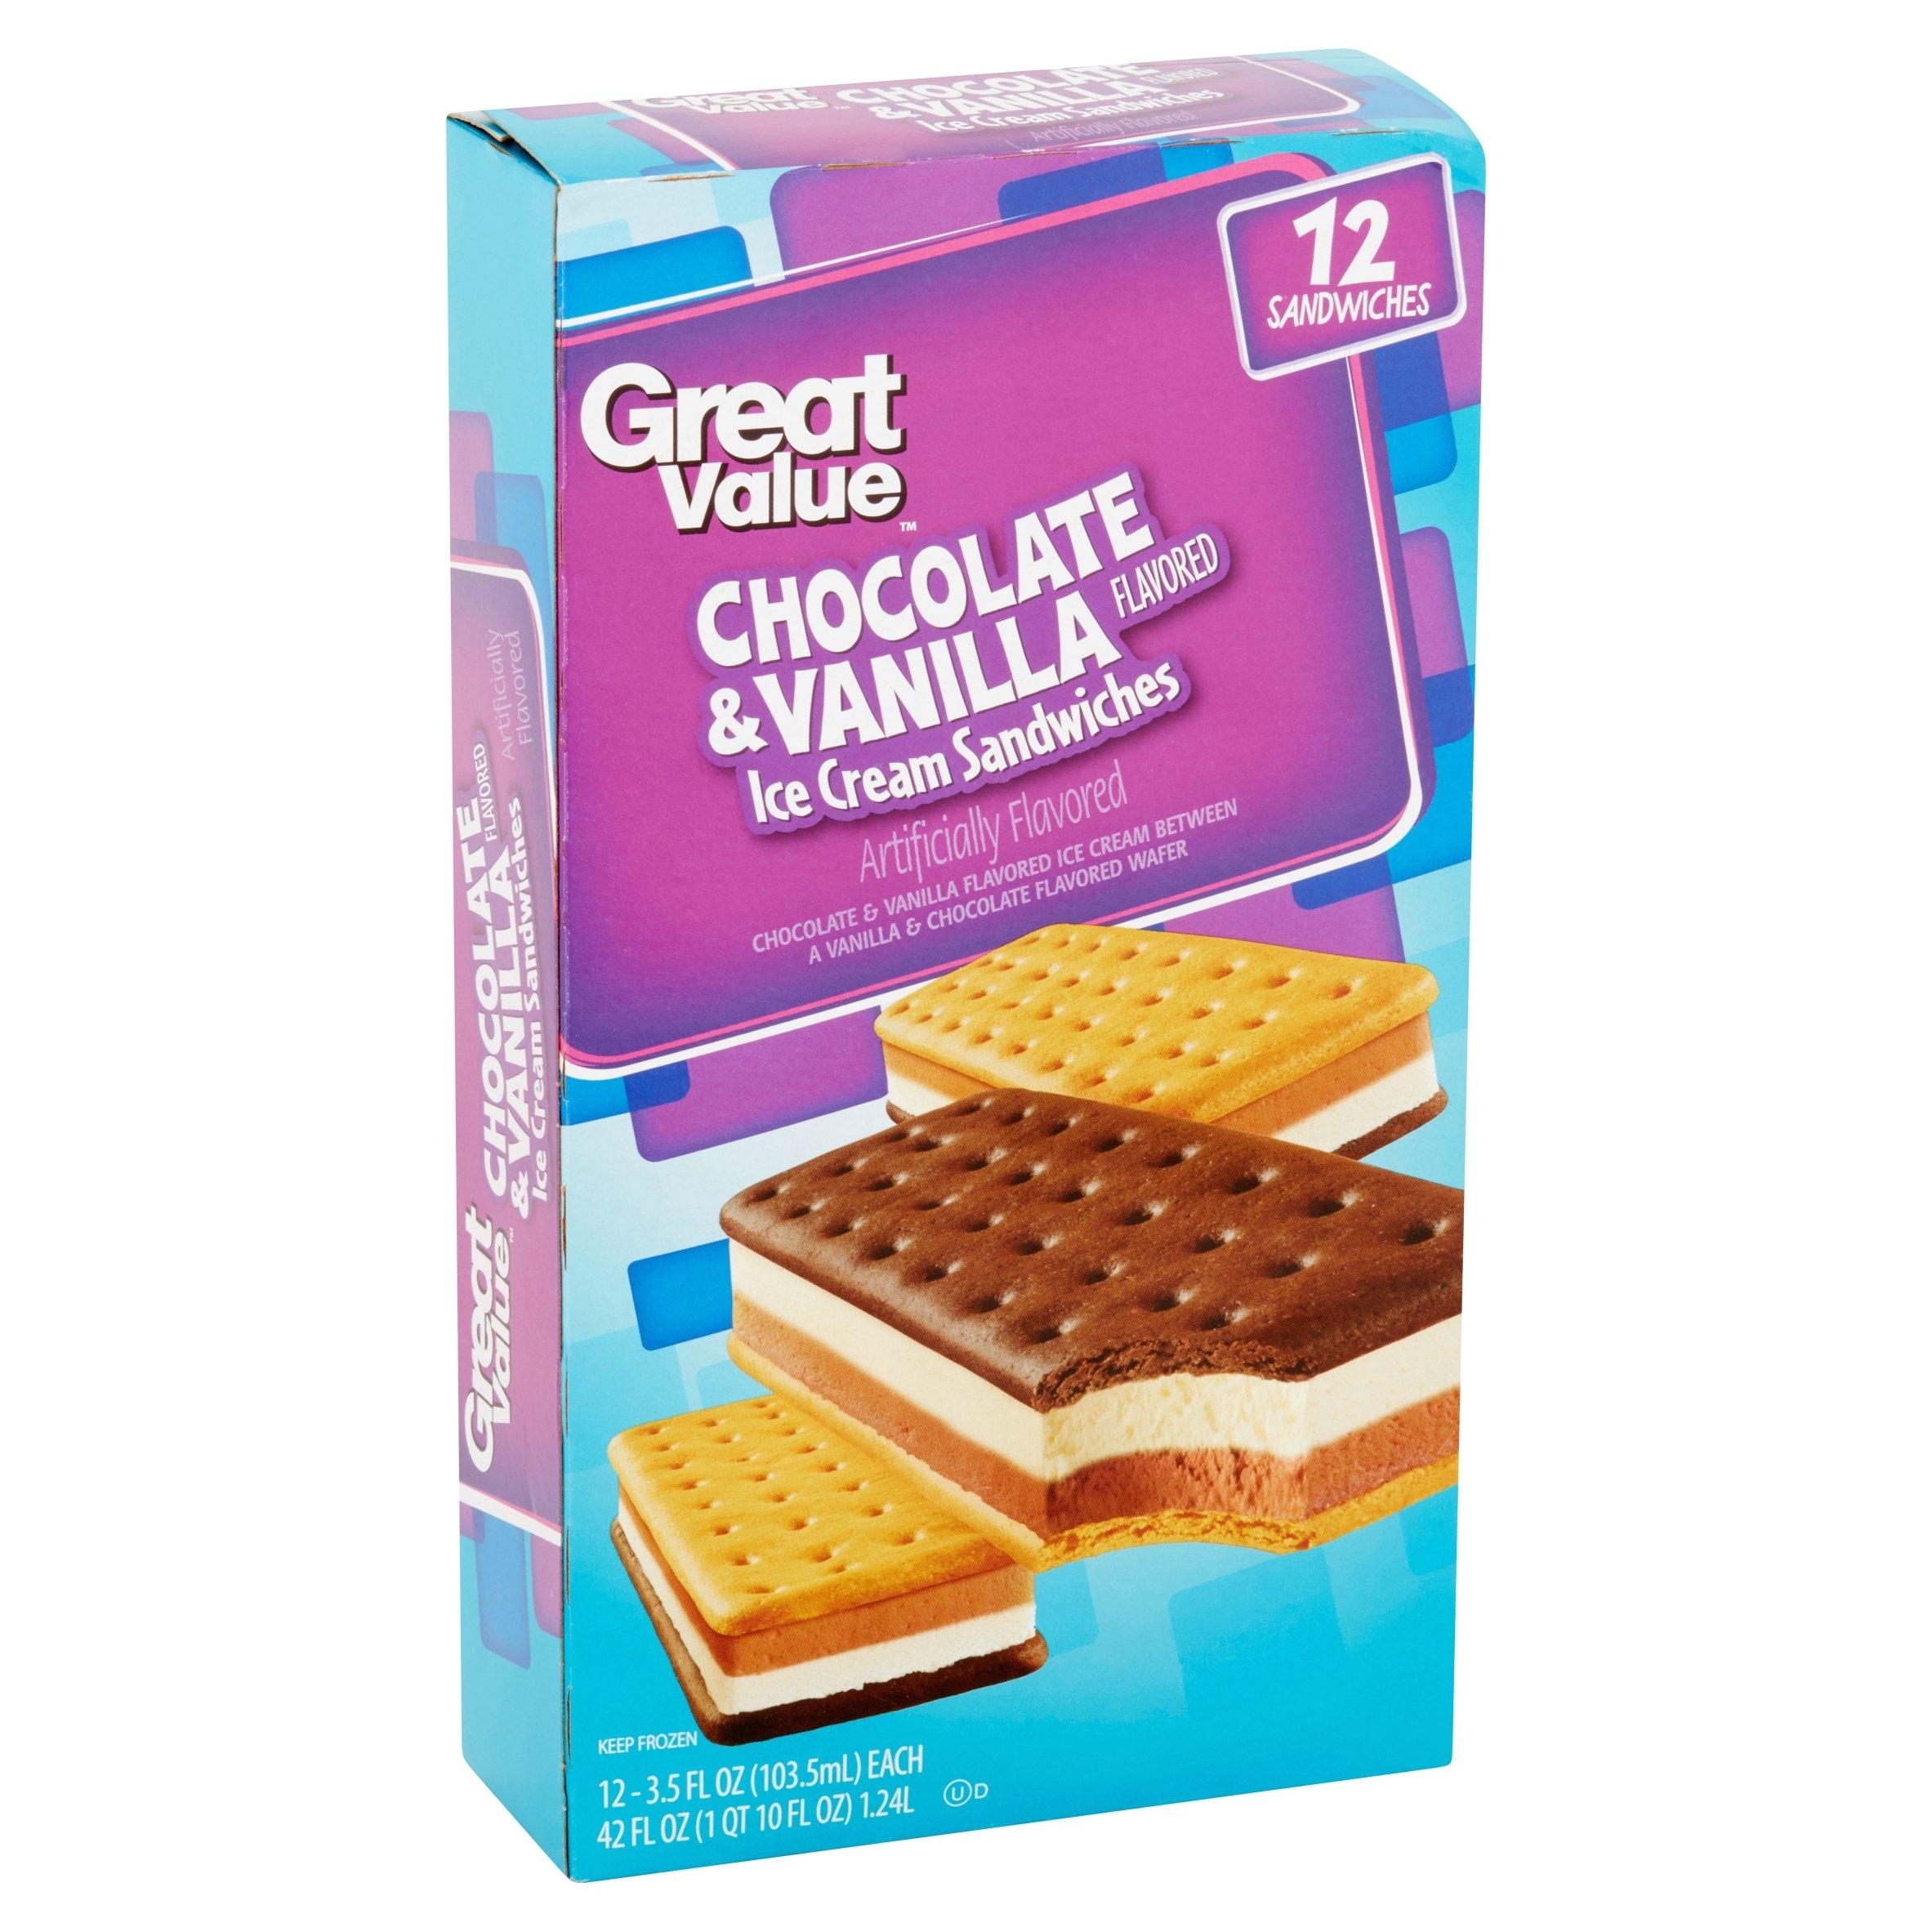 great value chocolate vanilla ice cream sandwiches 42 oz 12 count walmart com